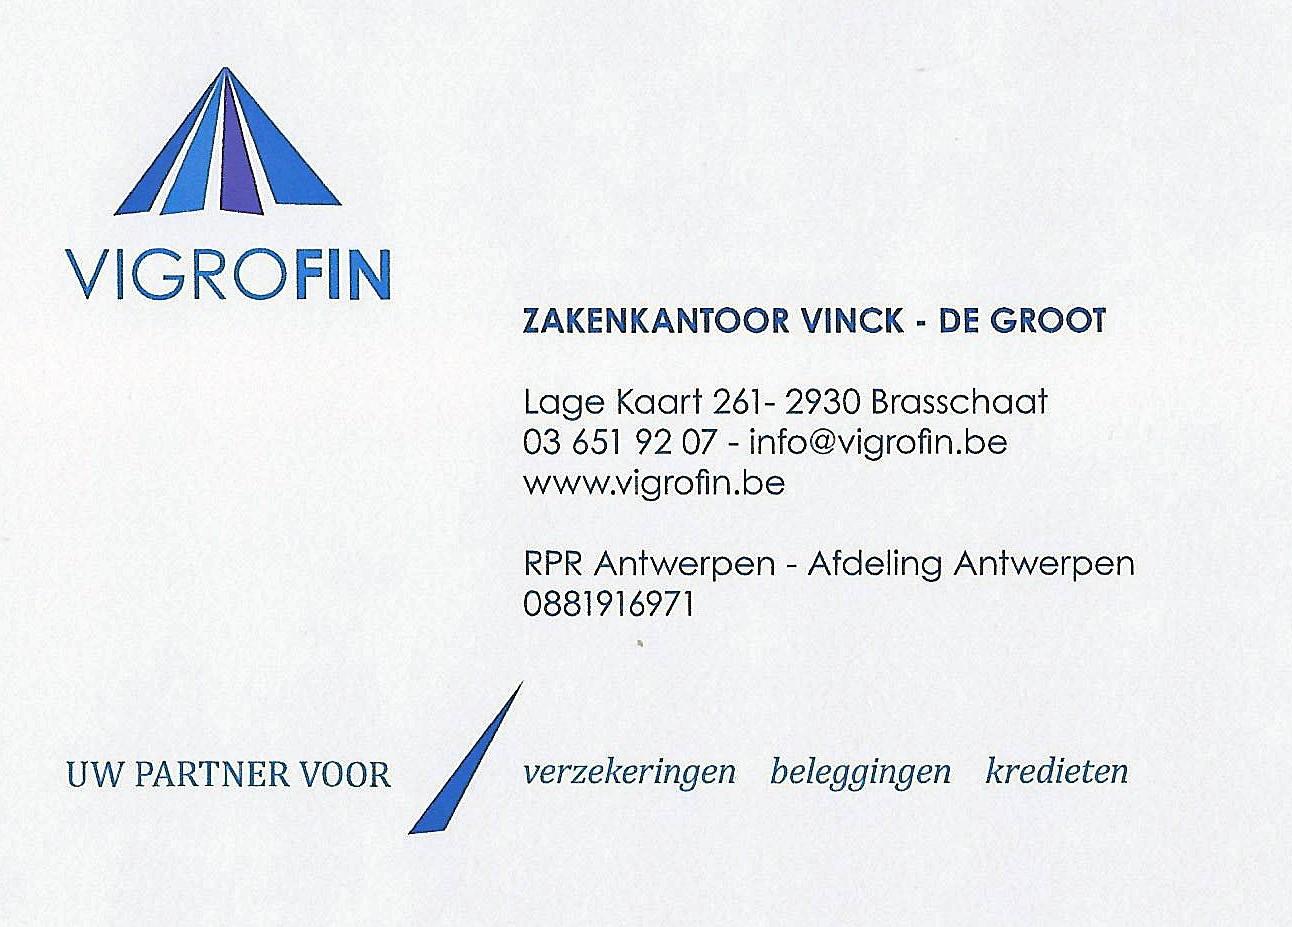 Vigrofin